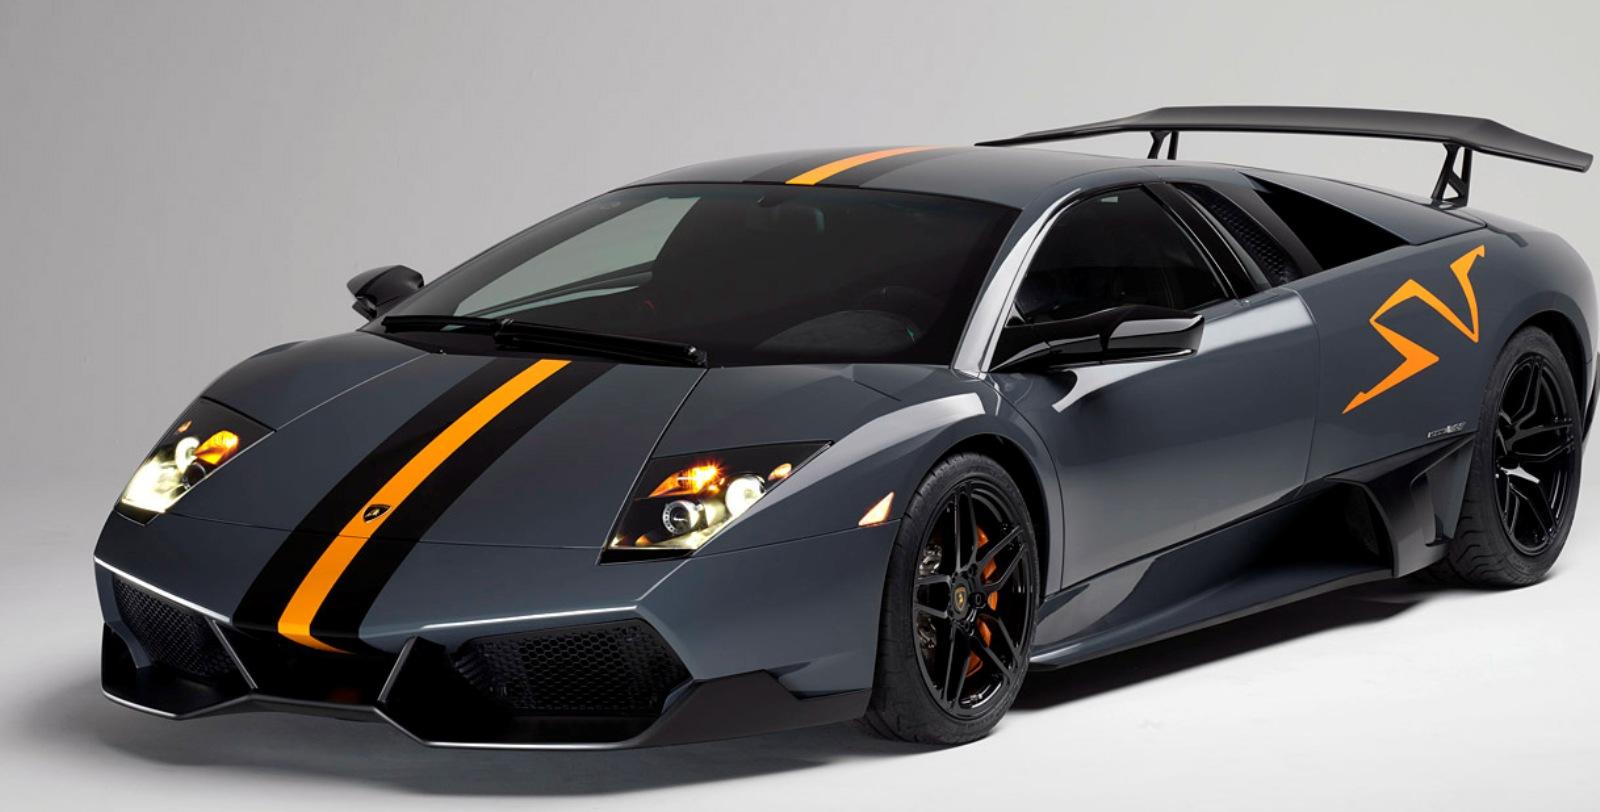 The New Lamborghini Sports Cars Models Wallpaper Amp Pictures